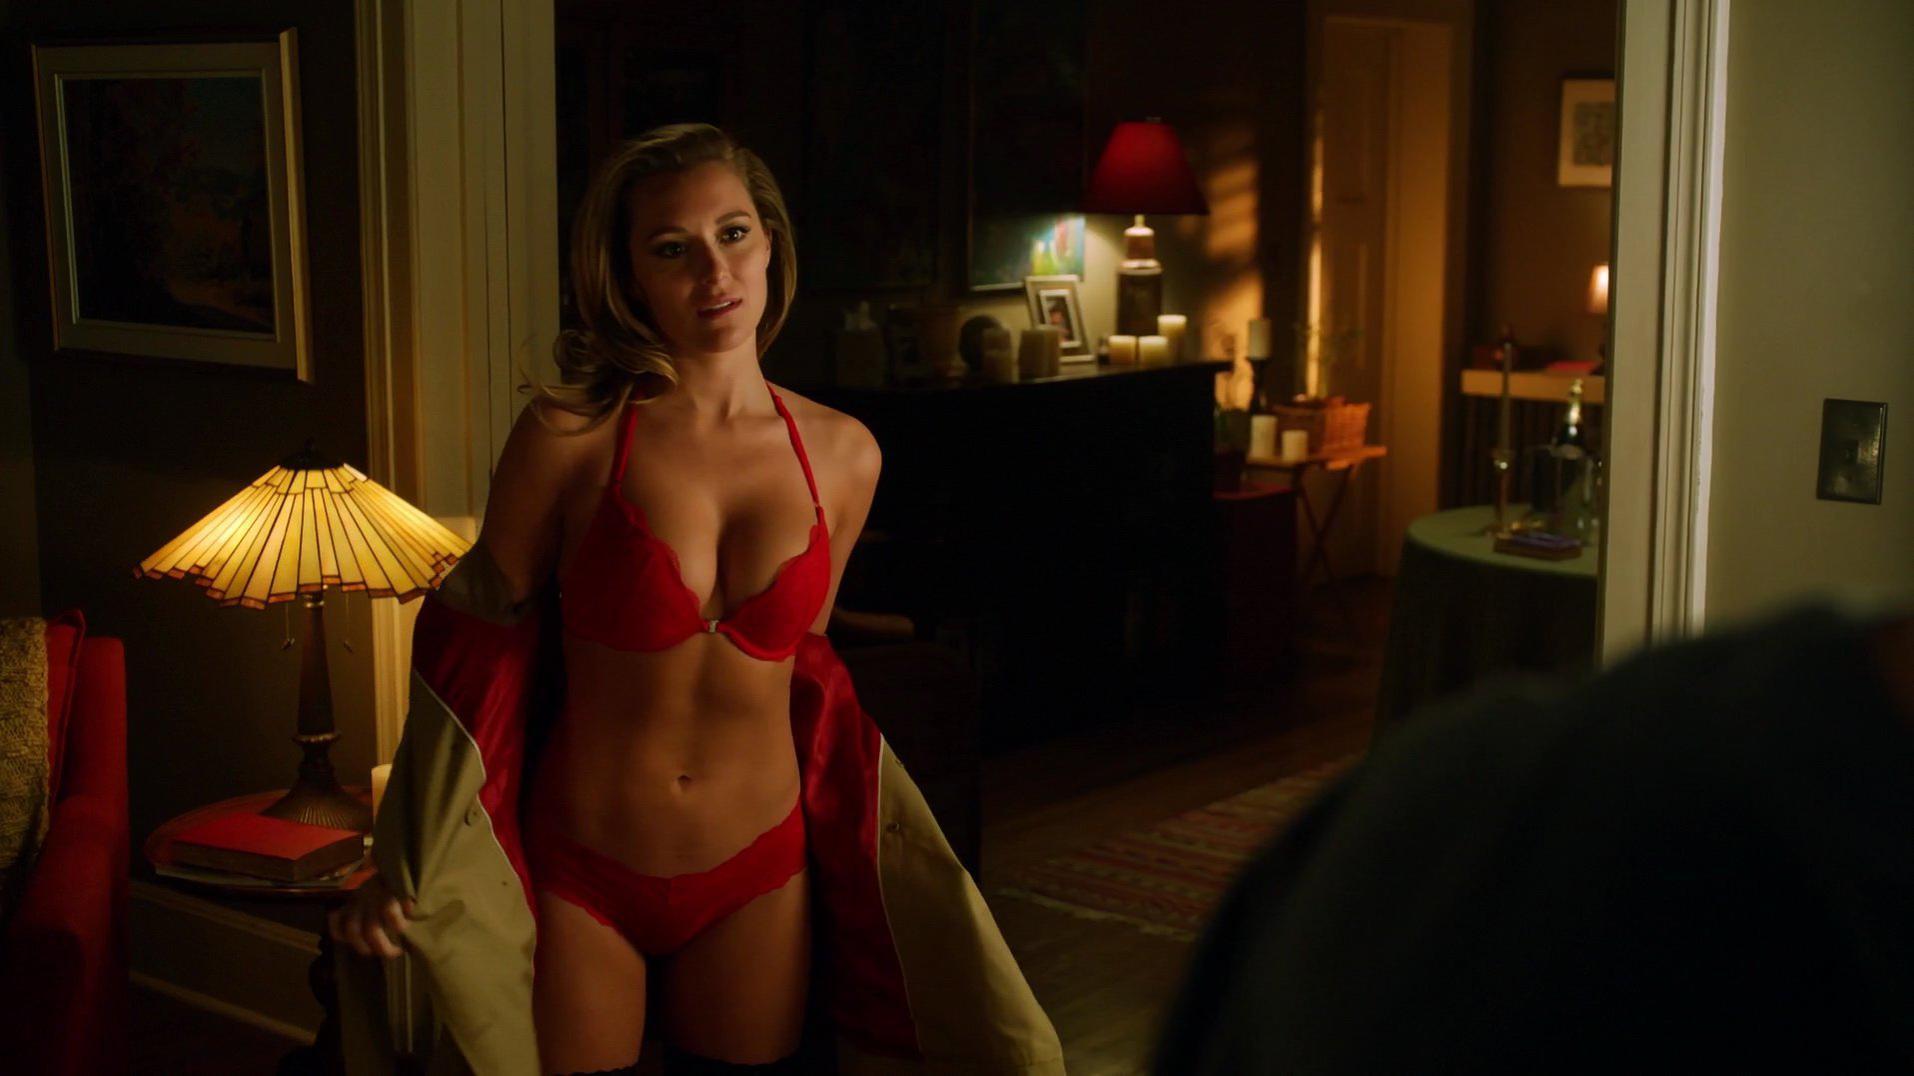 Alexa Vega sexy - The Tomorrow People s01e19 (2014)